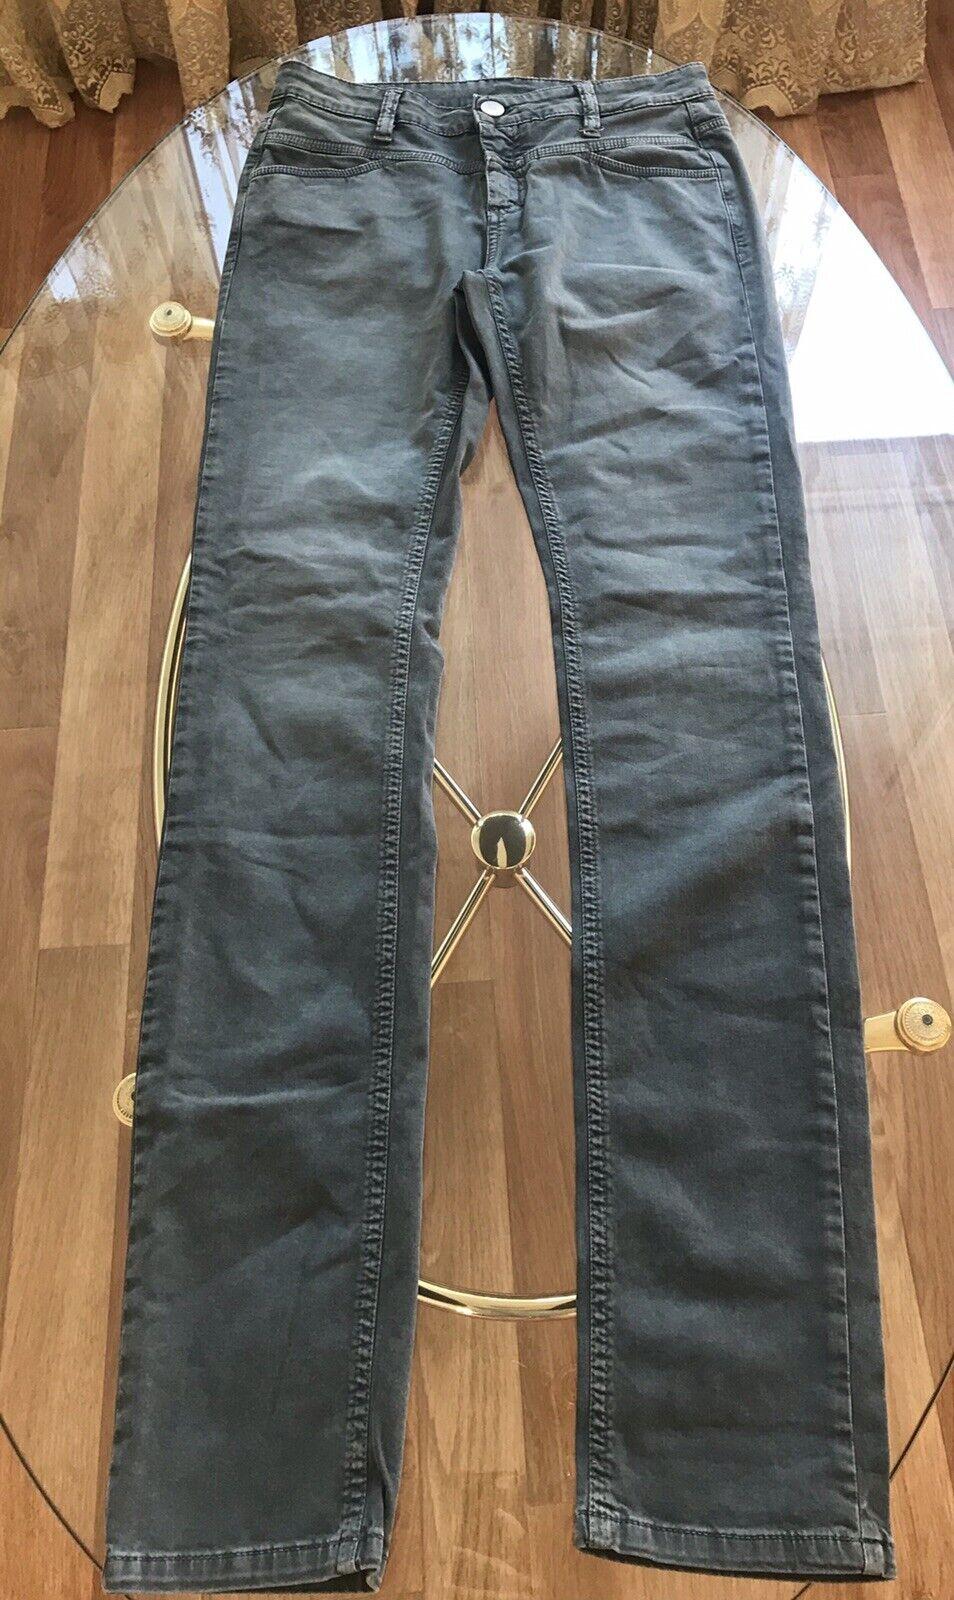 Closed ♥ Jeans Hose  it 40 XS S alta federal High waist italia pedal pusher nuevo  precios razonables